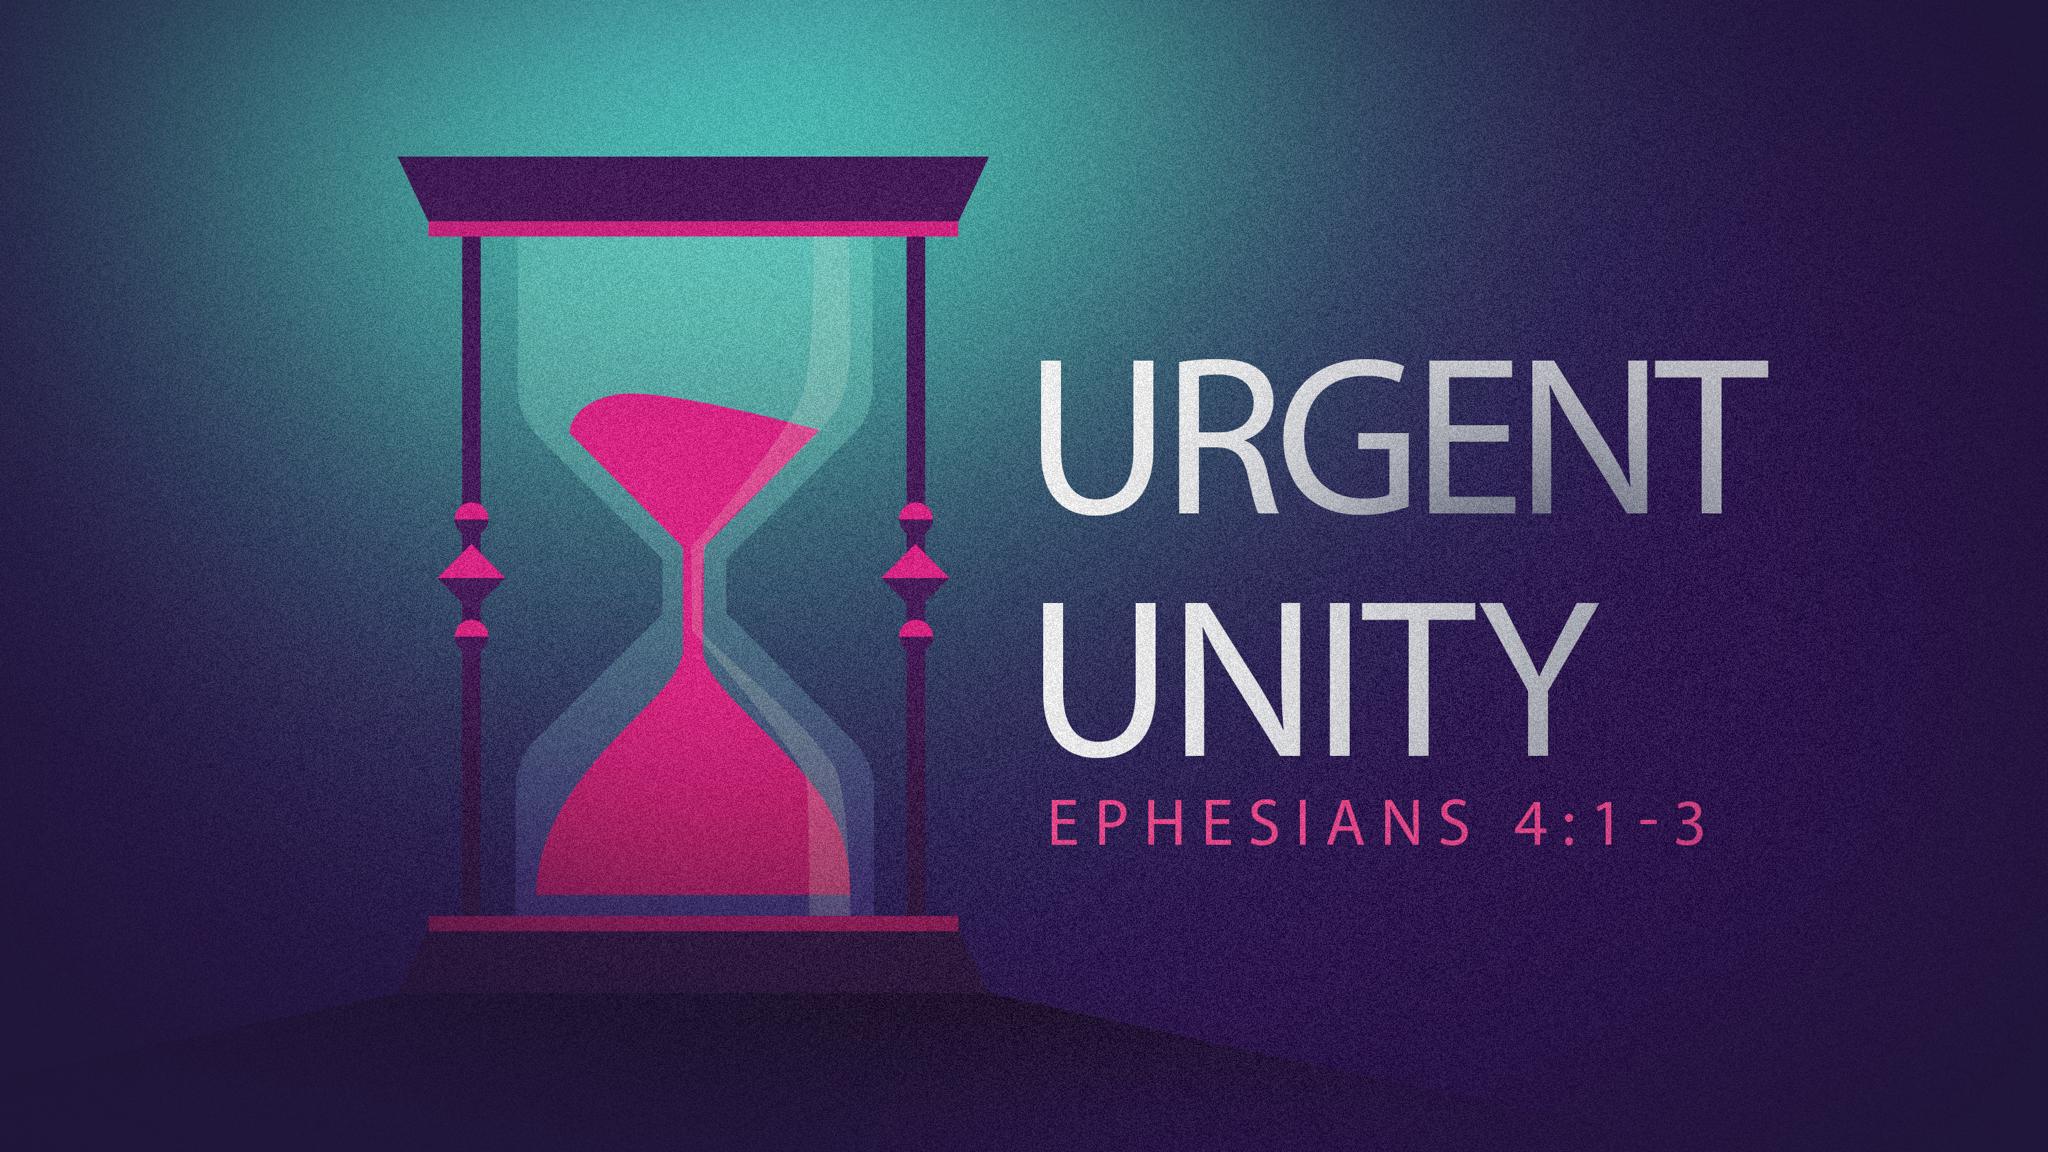 Urgent Unity